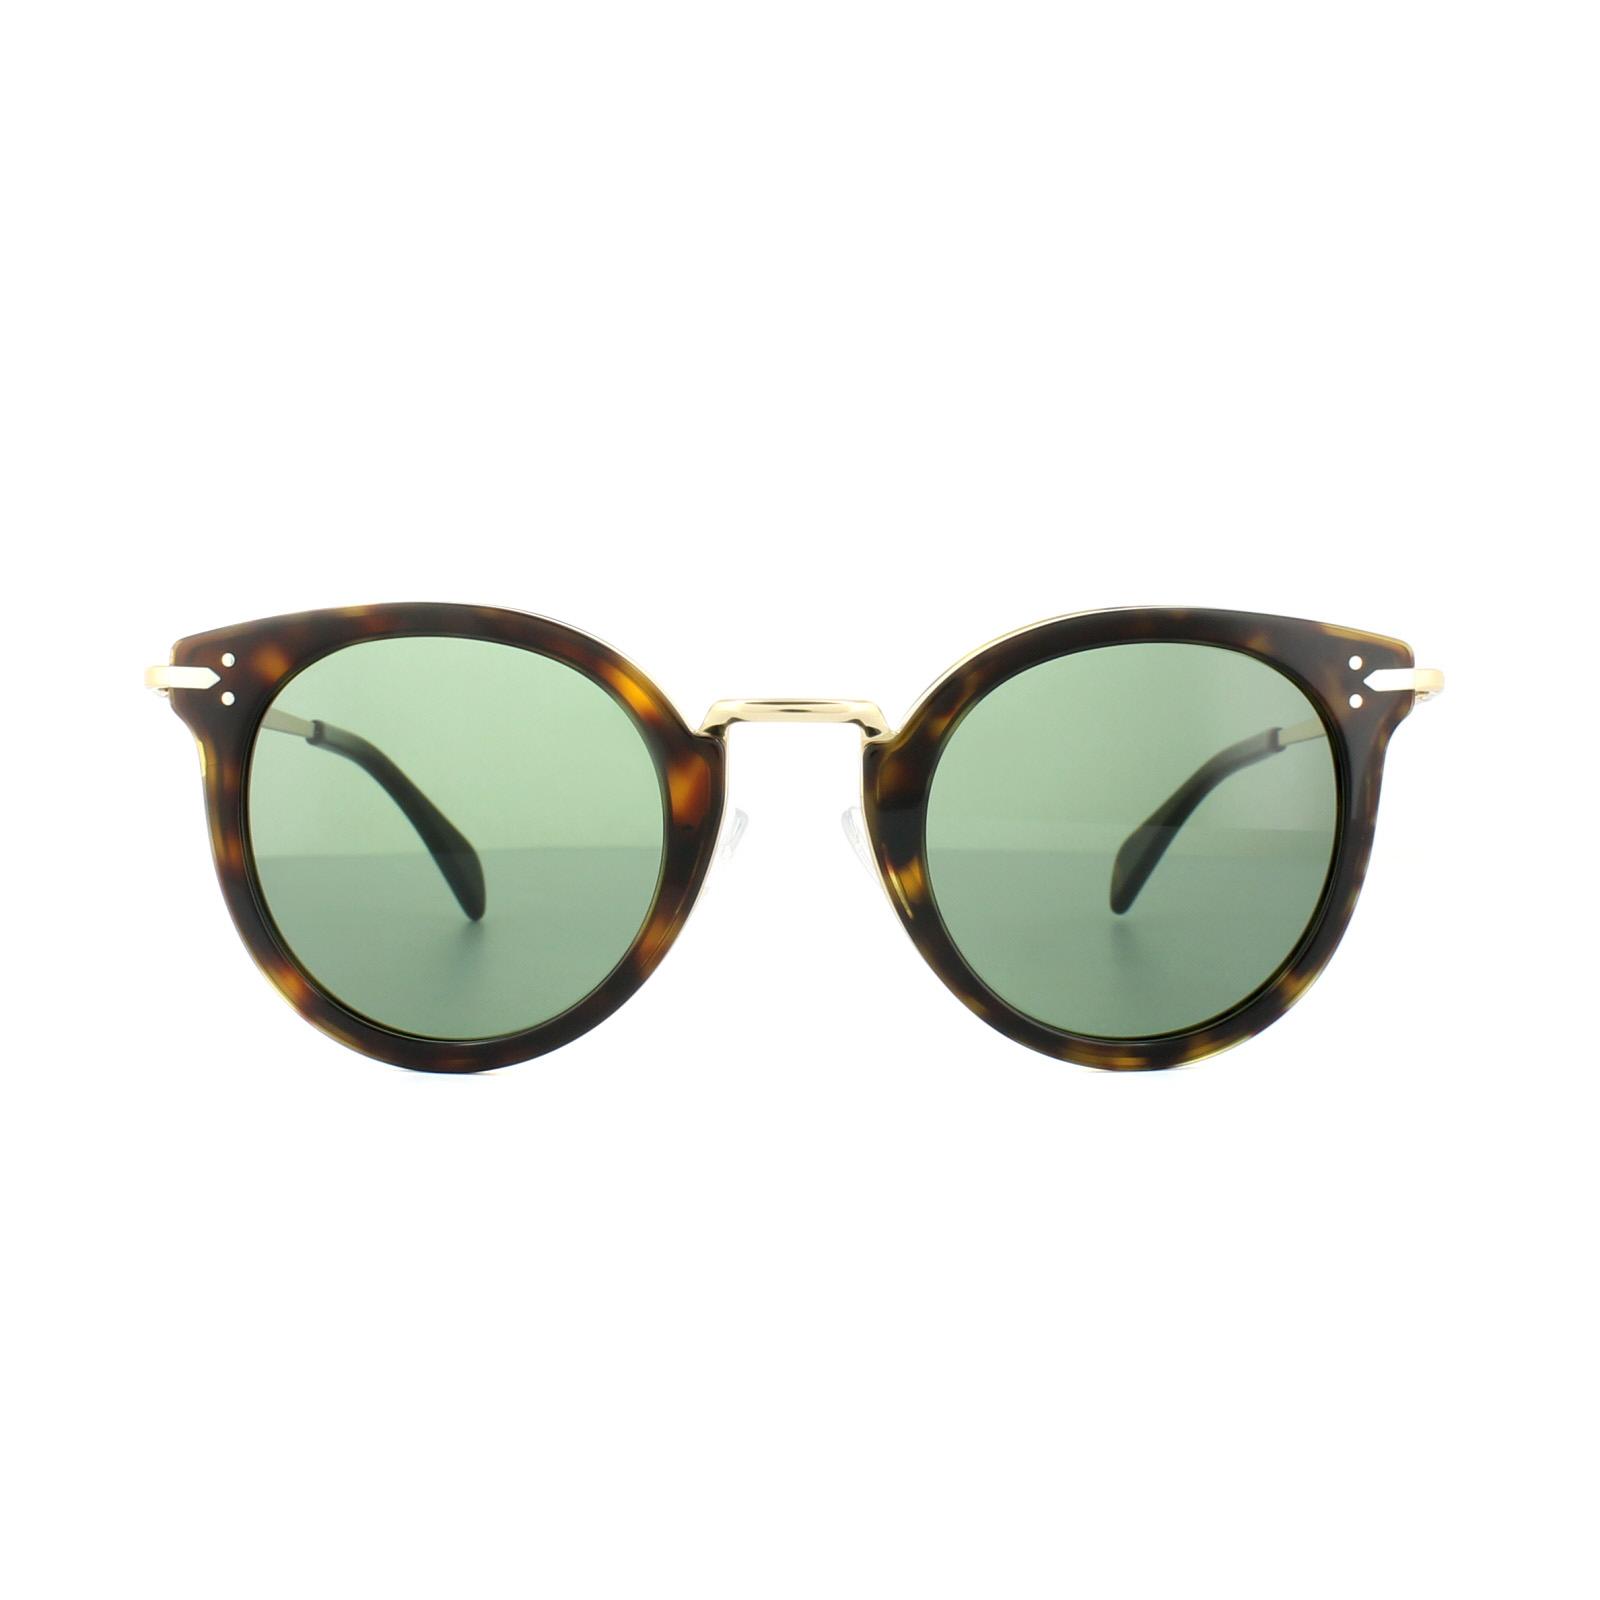 b4464a304a39 Sentinel Celine Sunglasses 41373 S Lea ANT 85 Havana Gold Grey Green